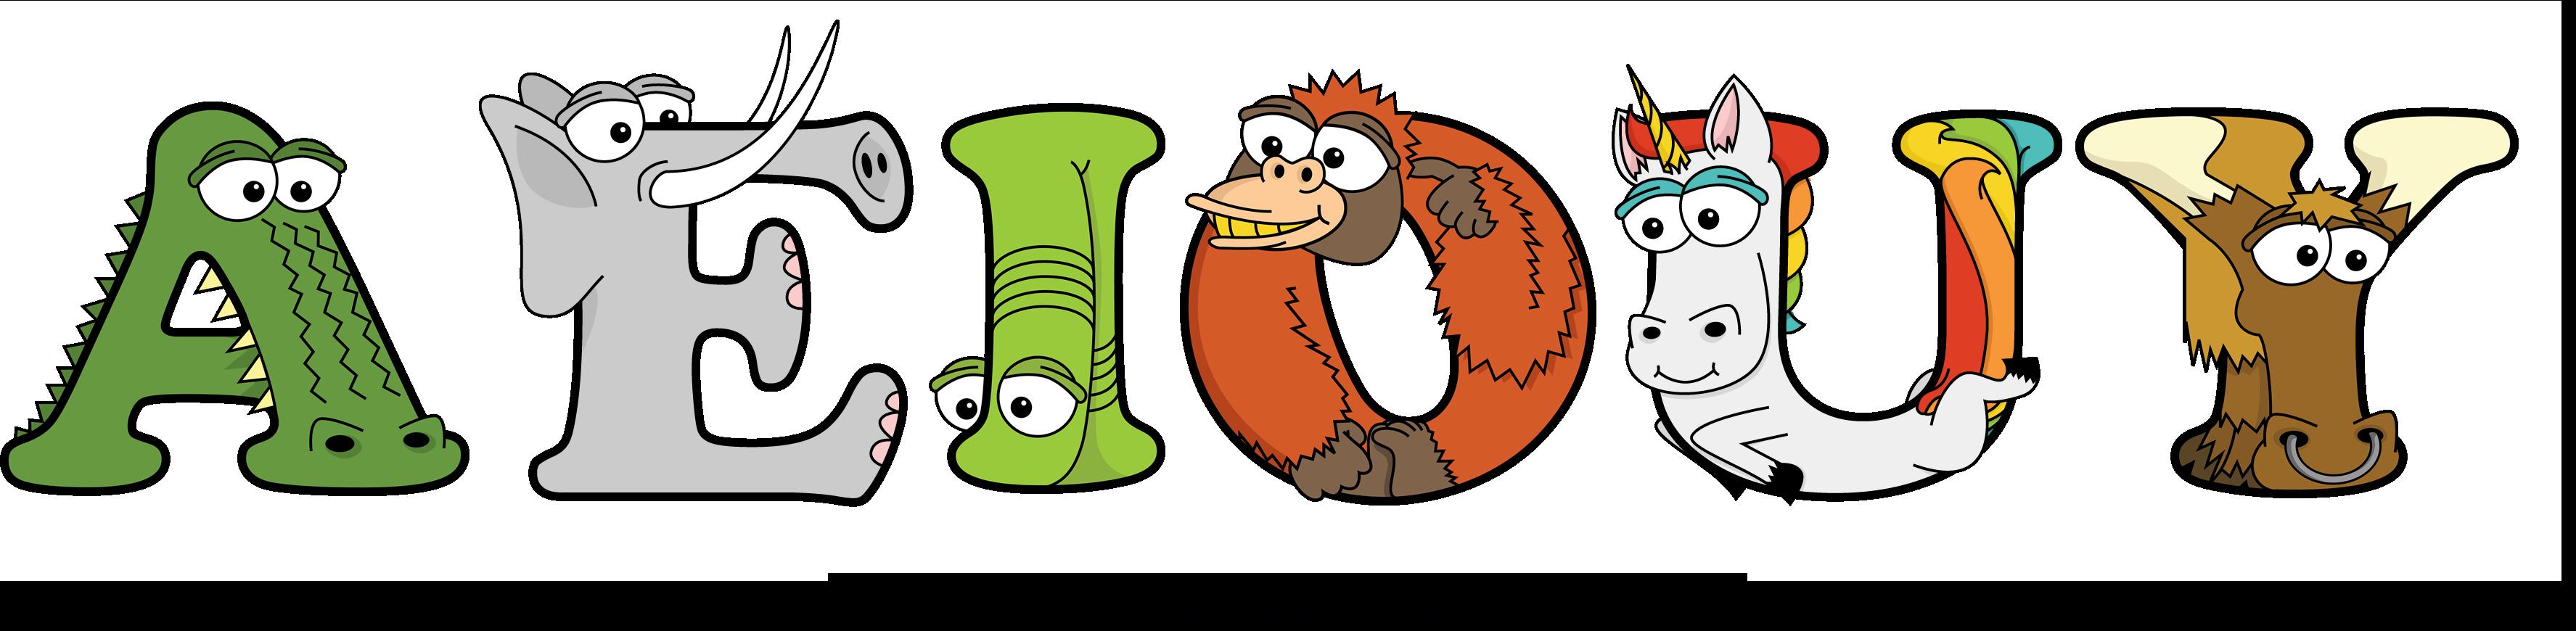 The word AEIOUY written in cute cartoon animal drawings